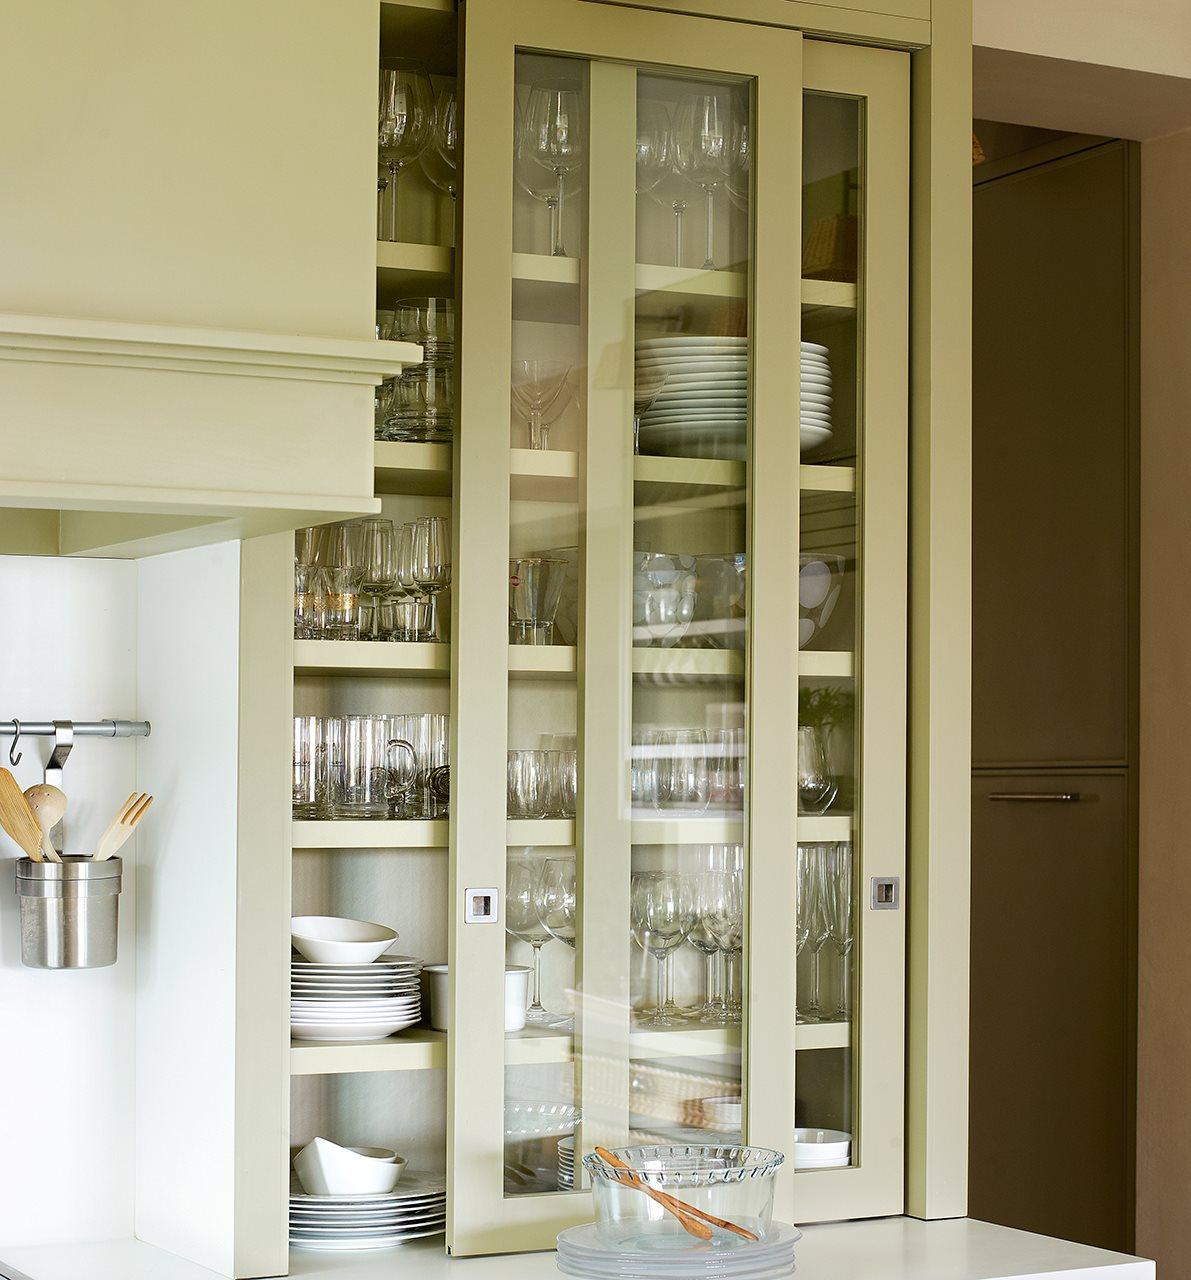 Trucos para organizar la cocina for Armarios para cocina